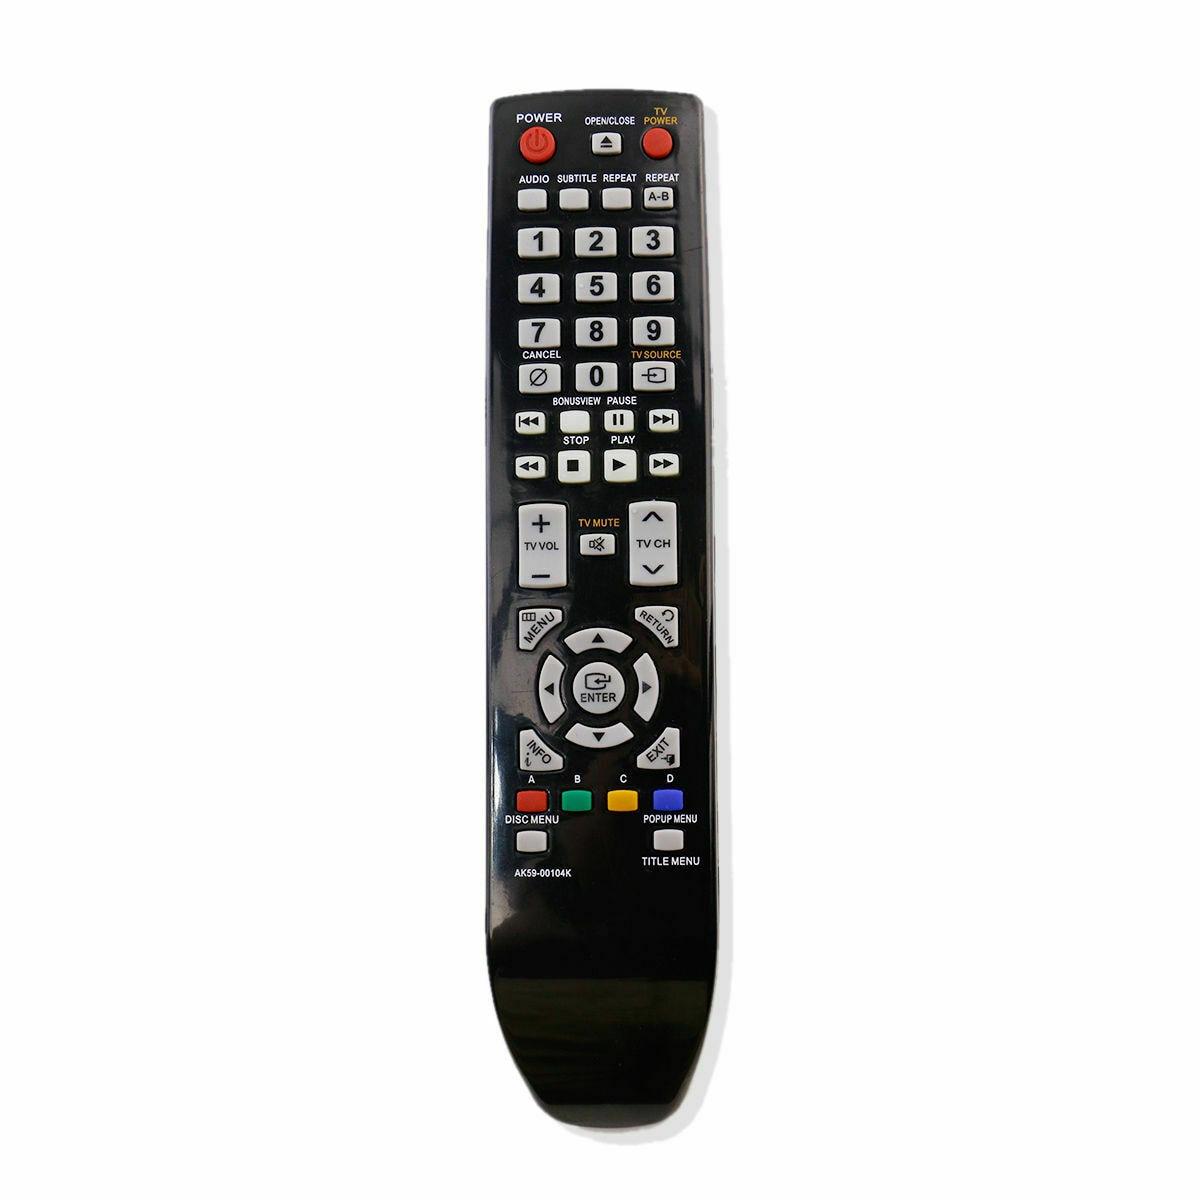 Mando a distancia para SAMSUNG AK59-00104K Blu-ray, BD-P1580, BD-P1590, 3600a